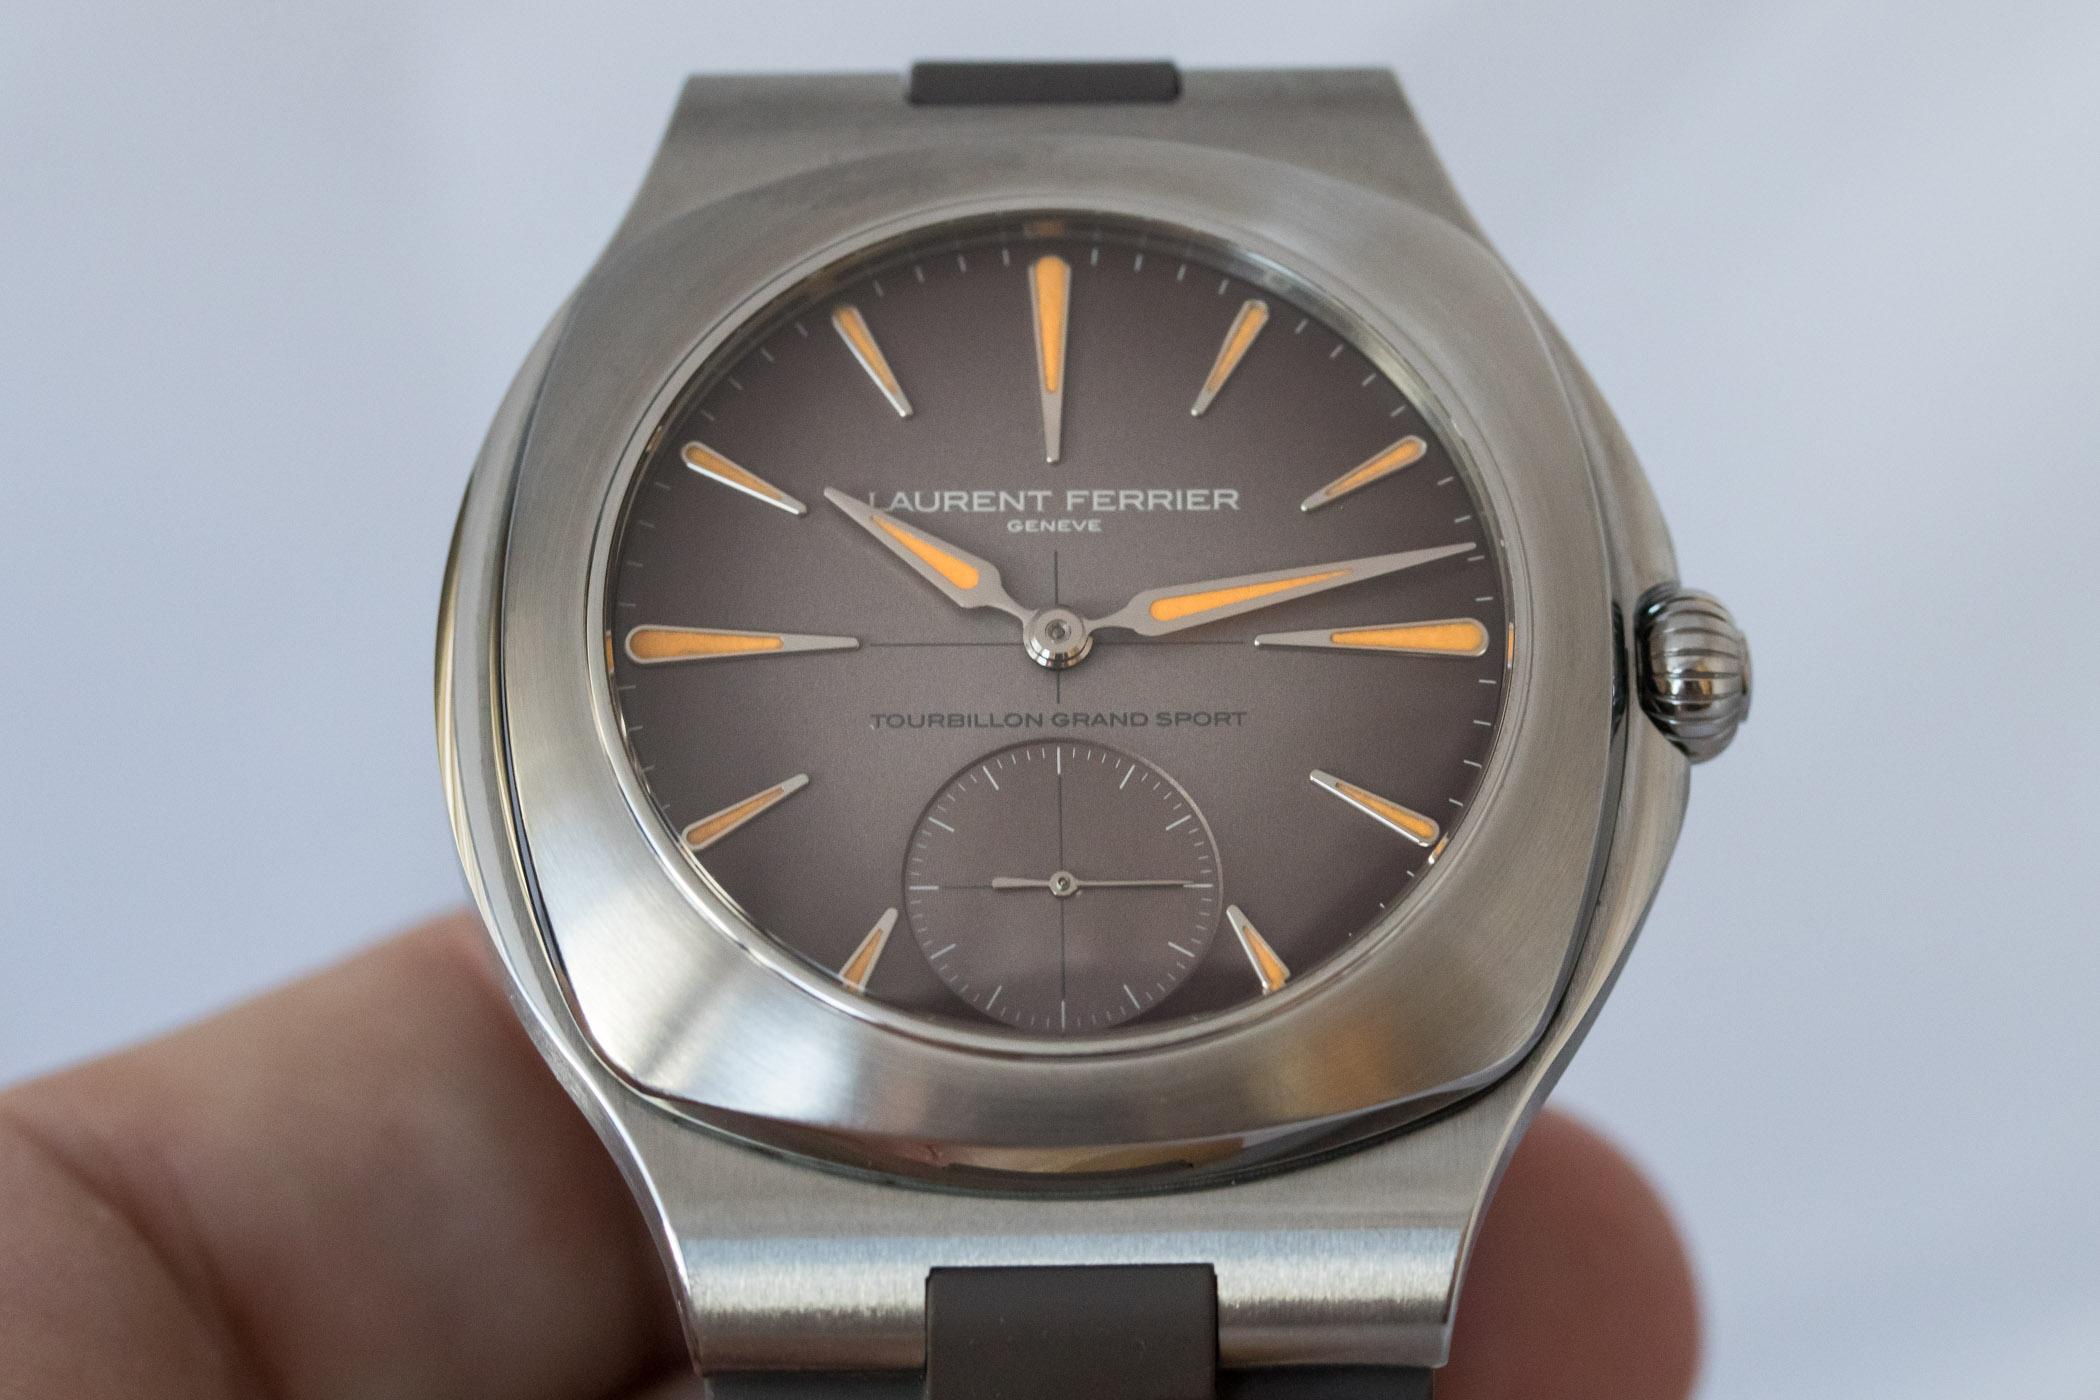 Laurent Ferrier Tourbillon Grand Sport - Steel Luxury Sports Watch - 16